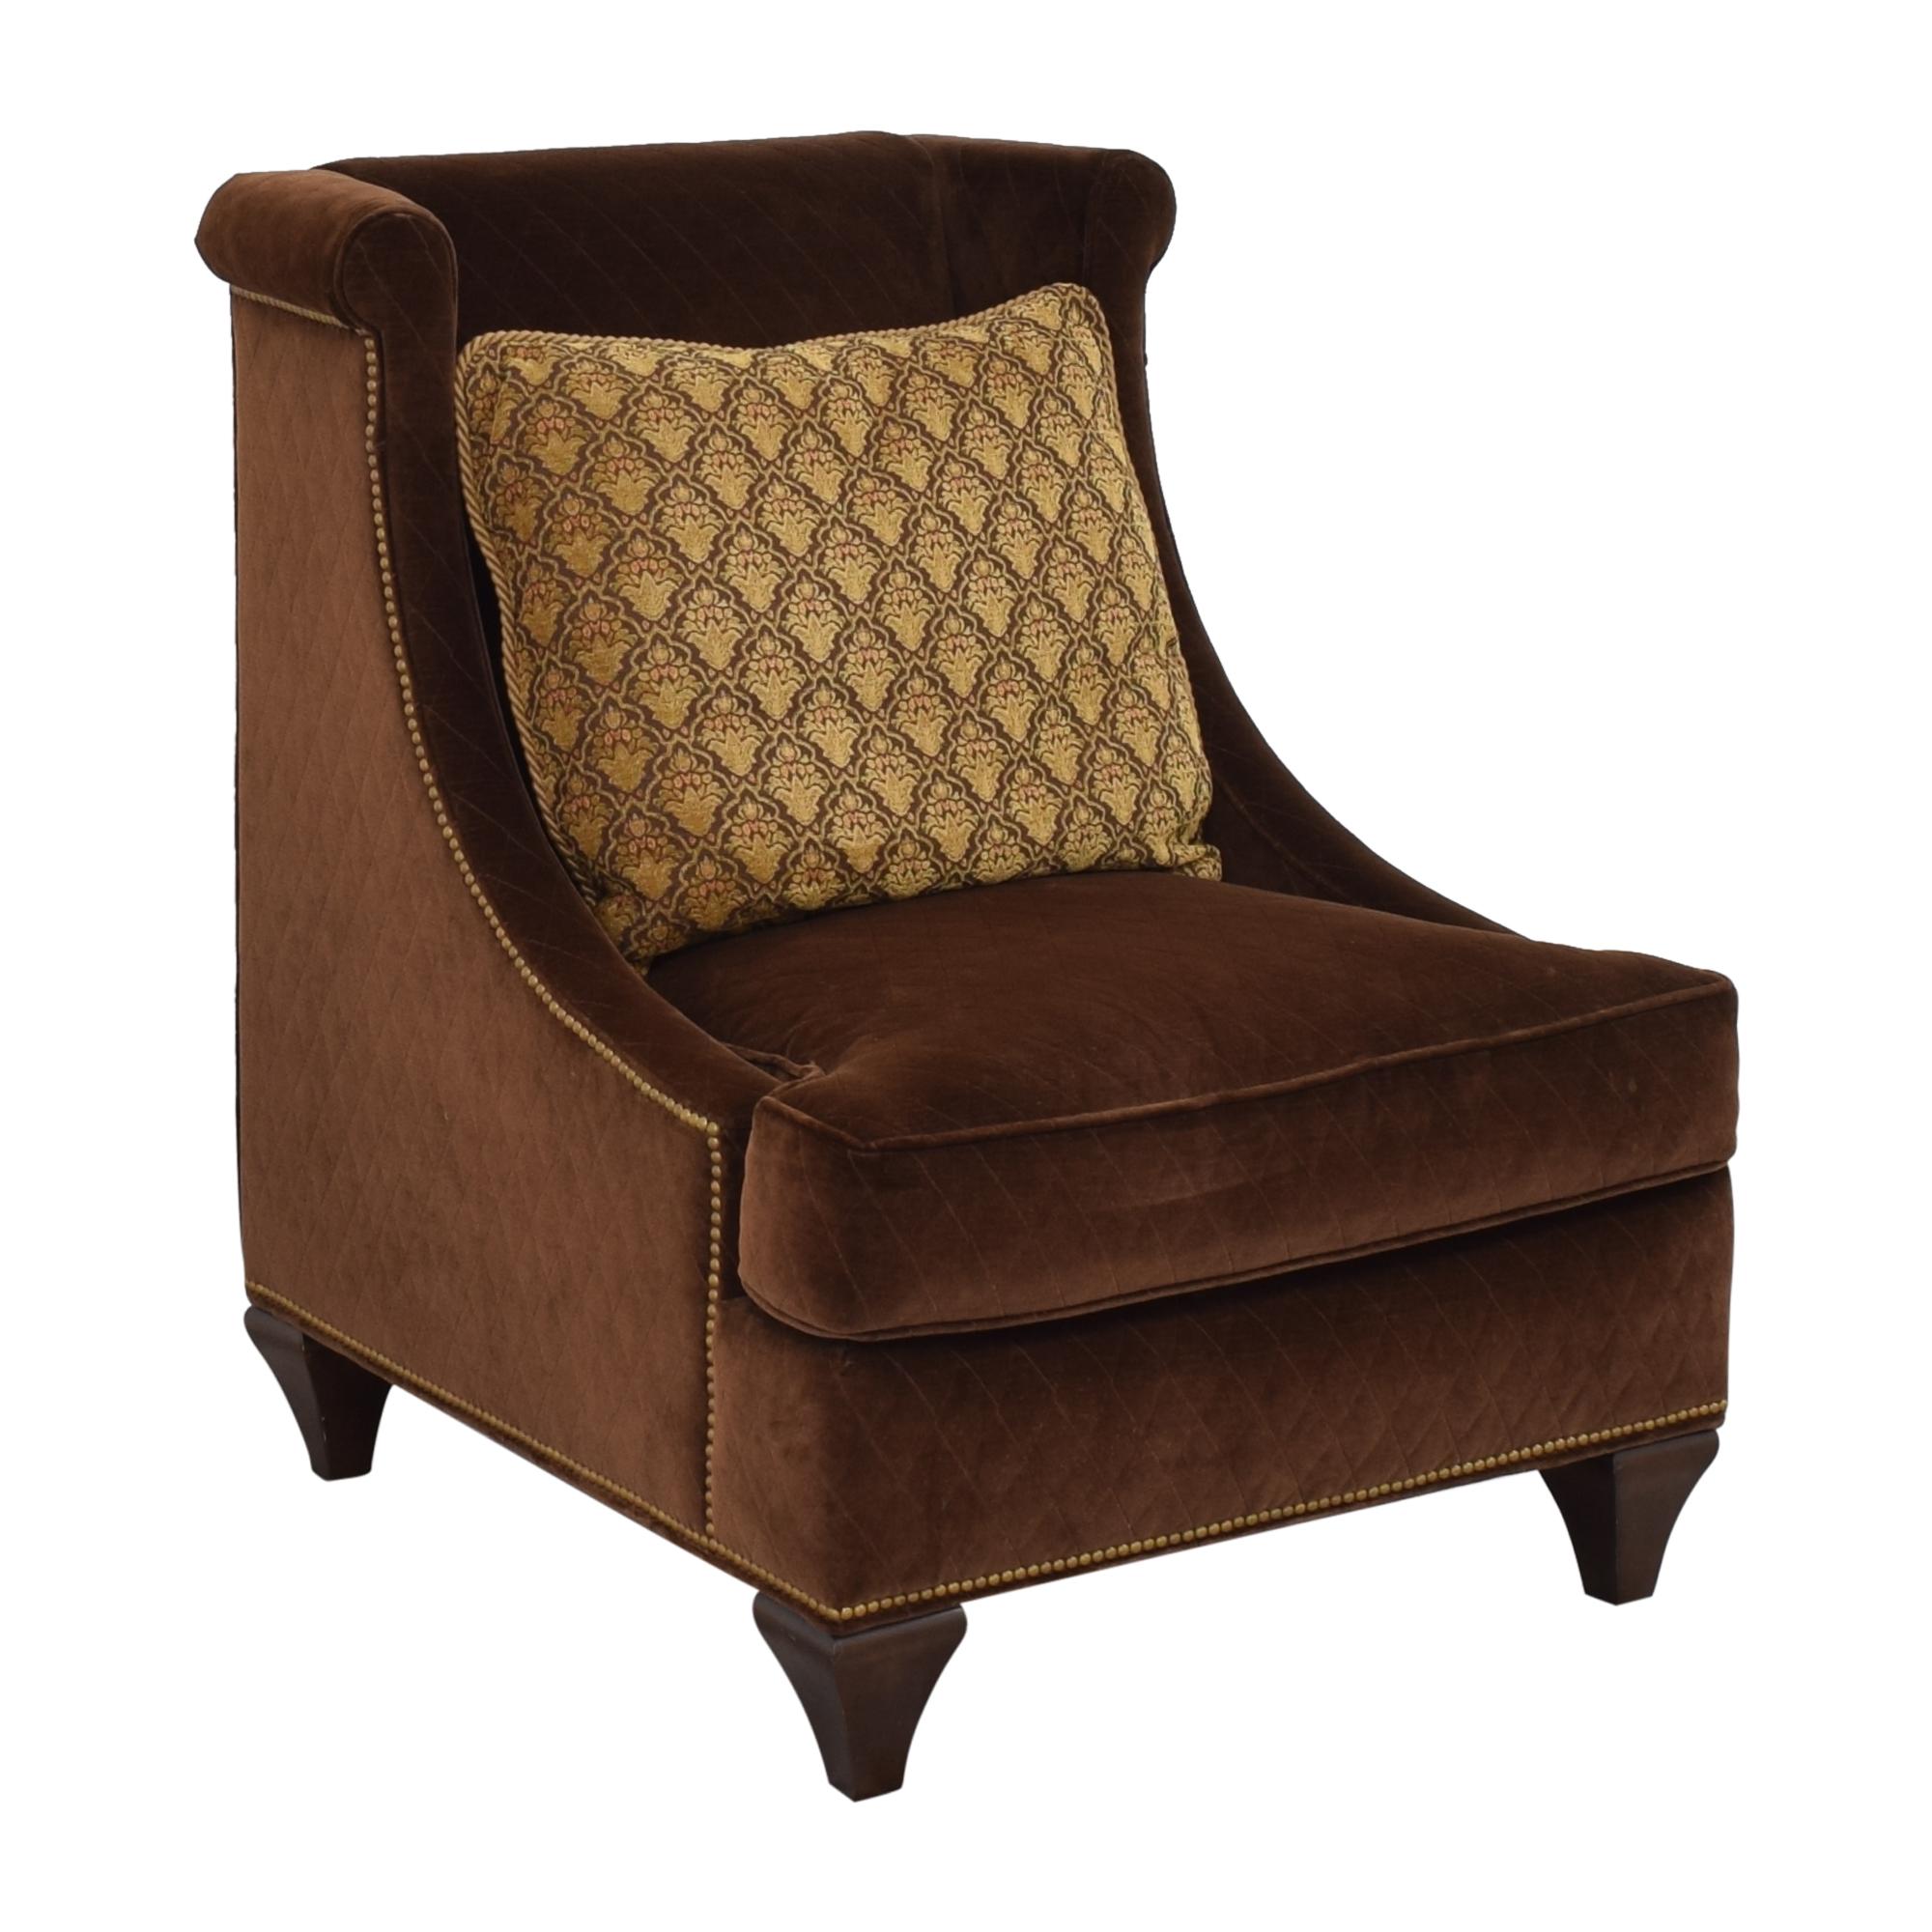 shop Stanford Furniture Blane Chair Stanford Furniture Chairs